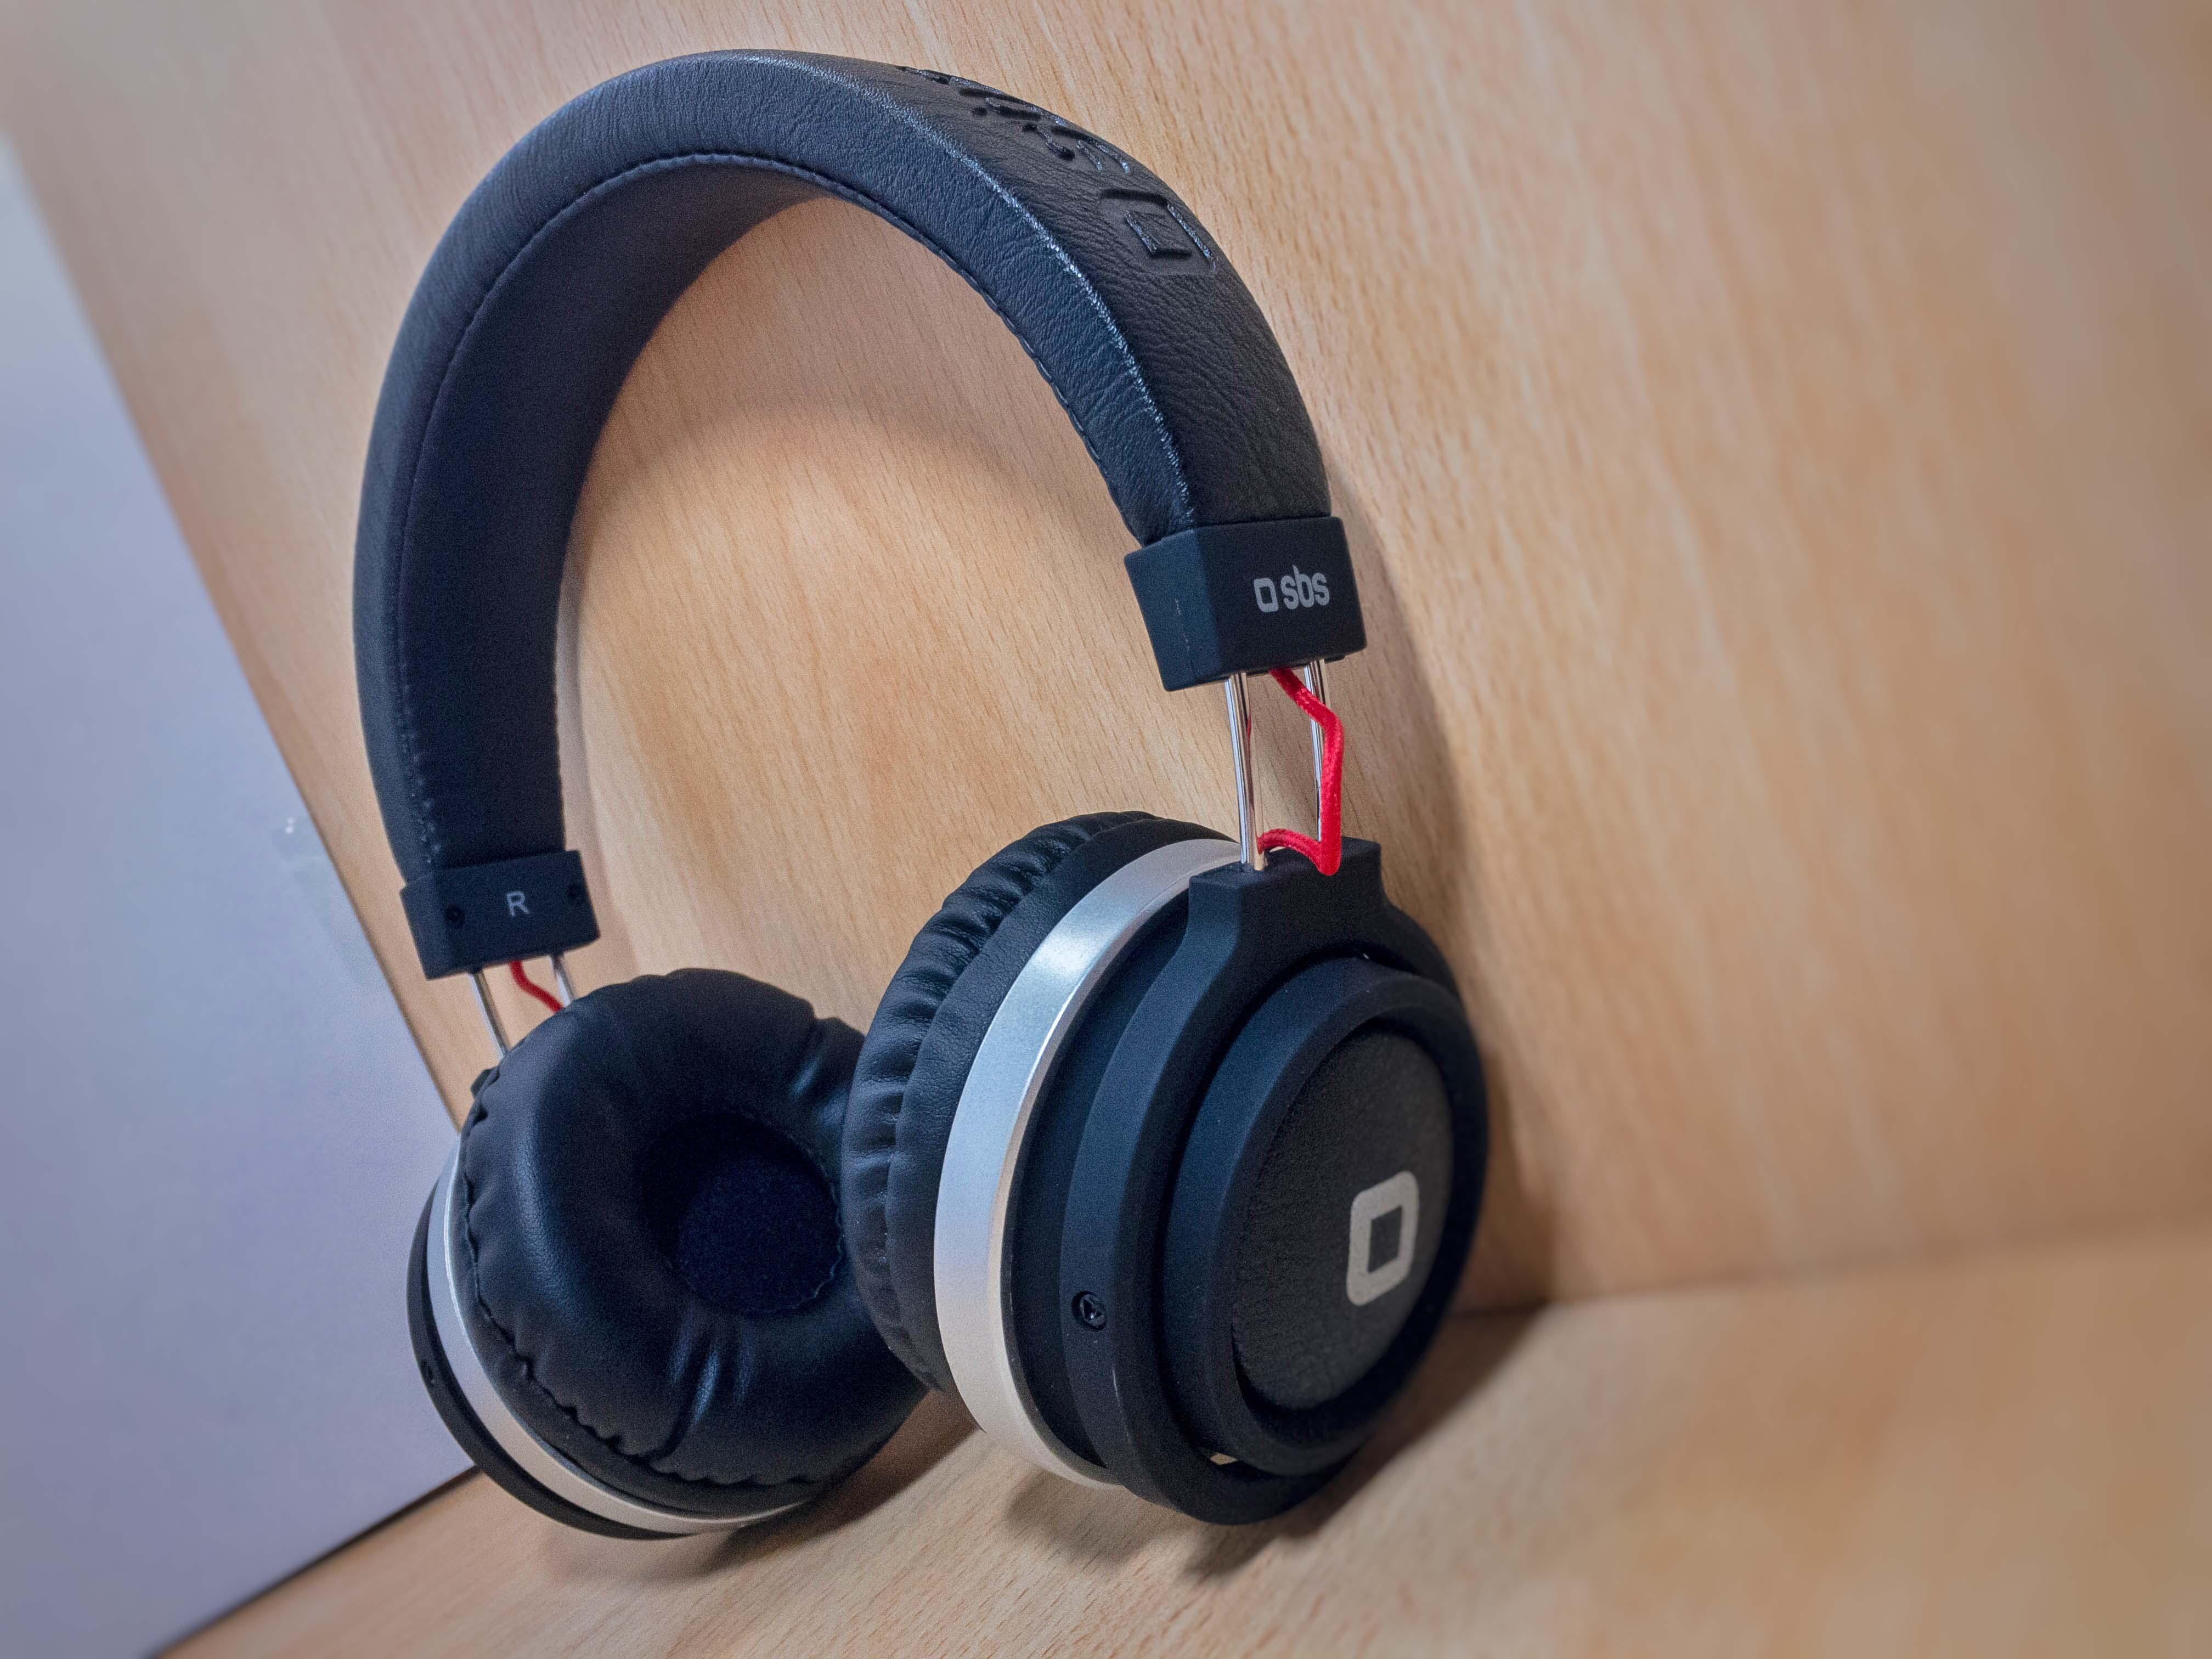 Cuffie stereo bluetooth sbs ,l'headset per tutti!